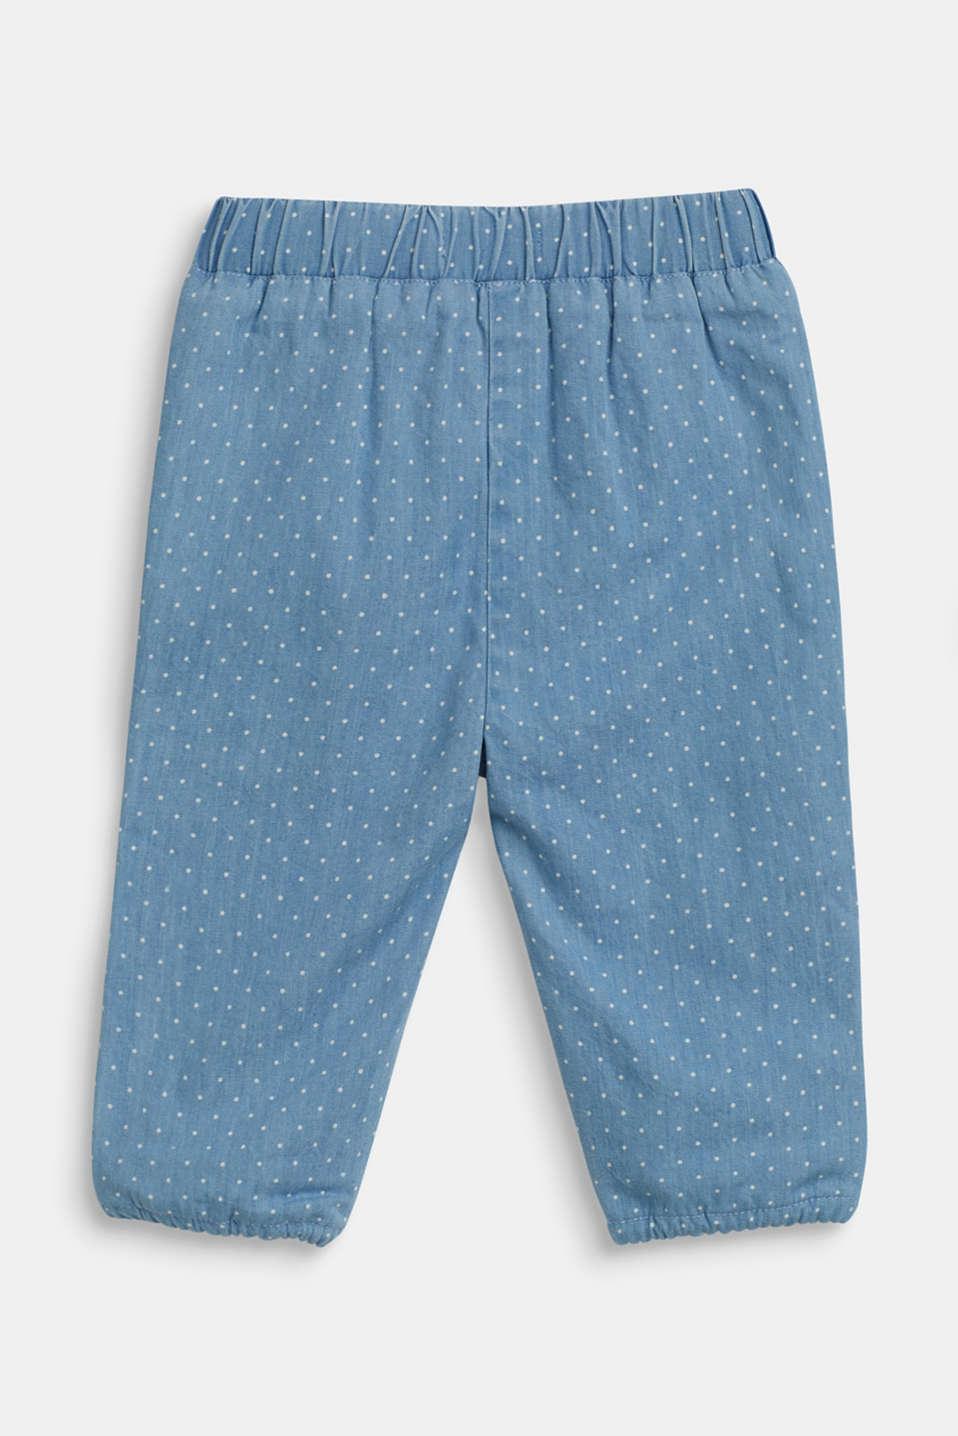 Denim-effect polka dot trousers, LCBLUE LIGHT WAS, detail image number 1